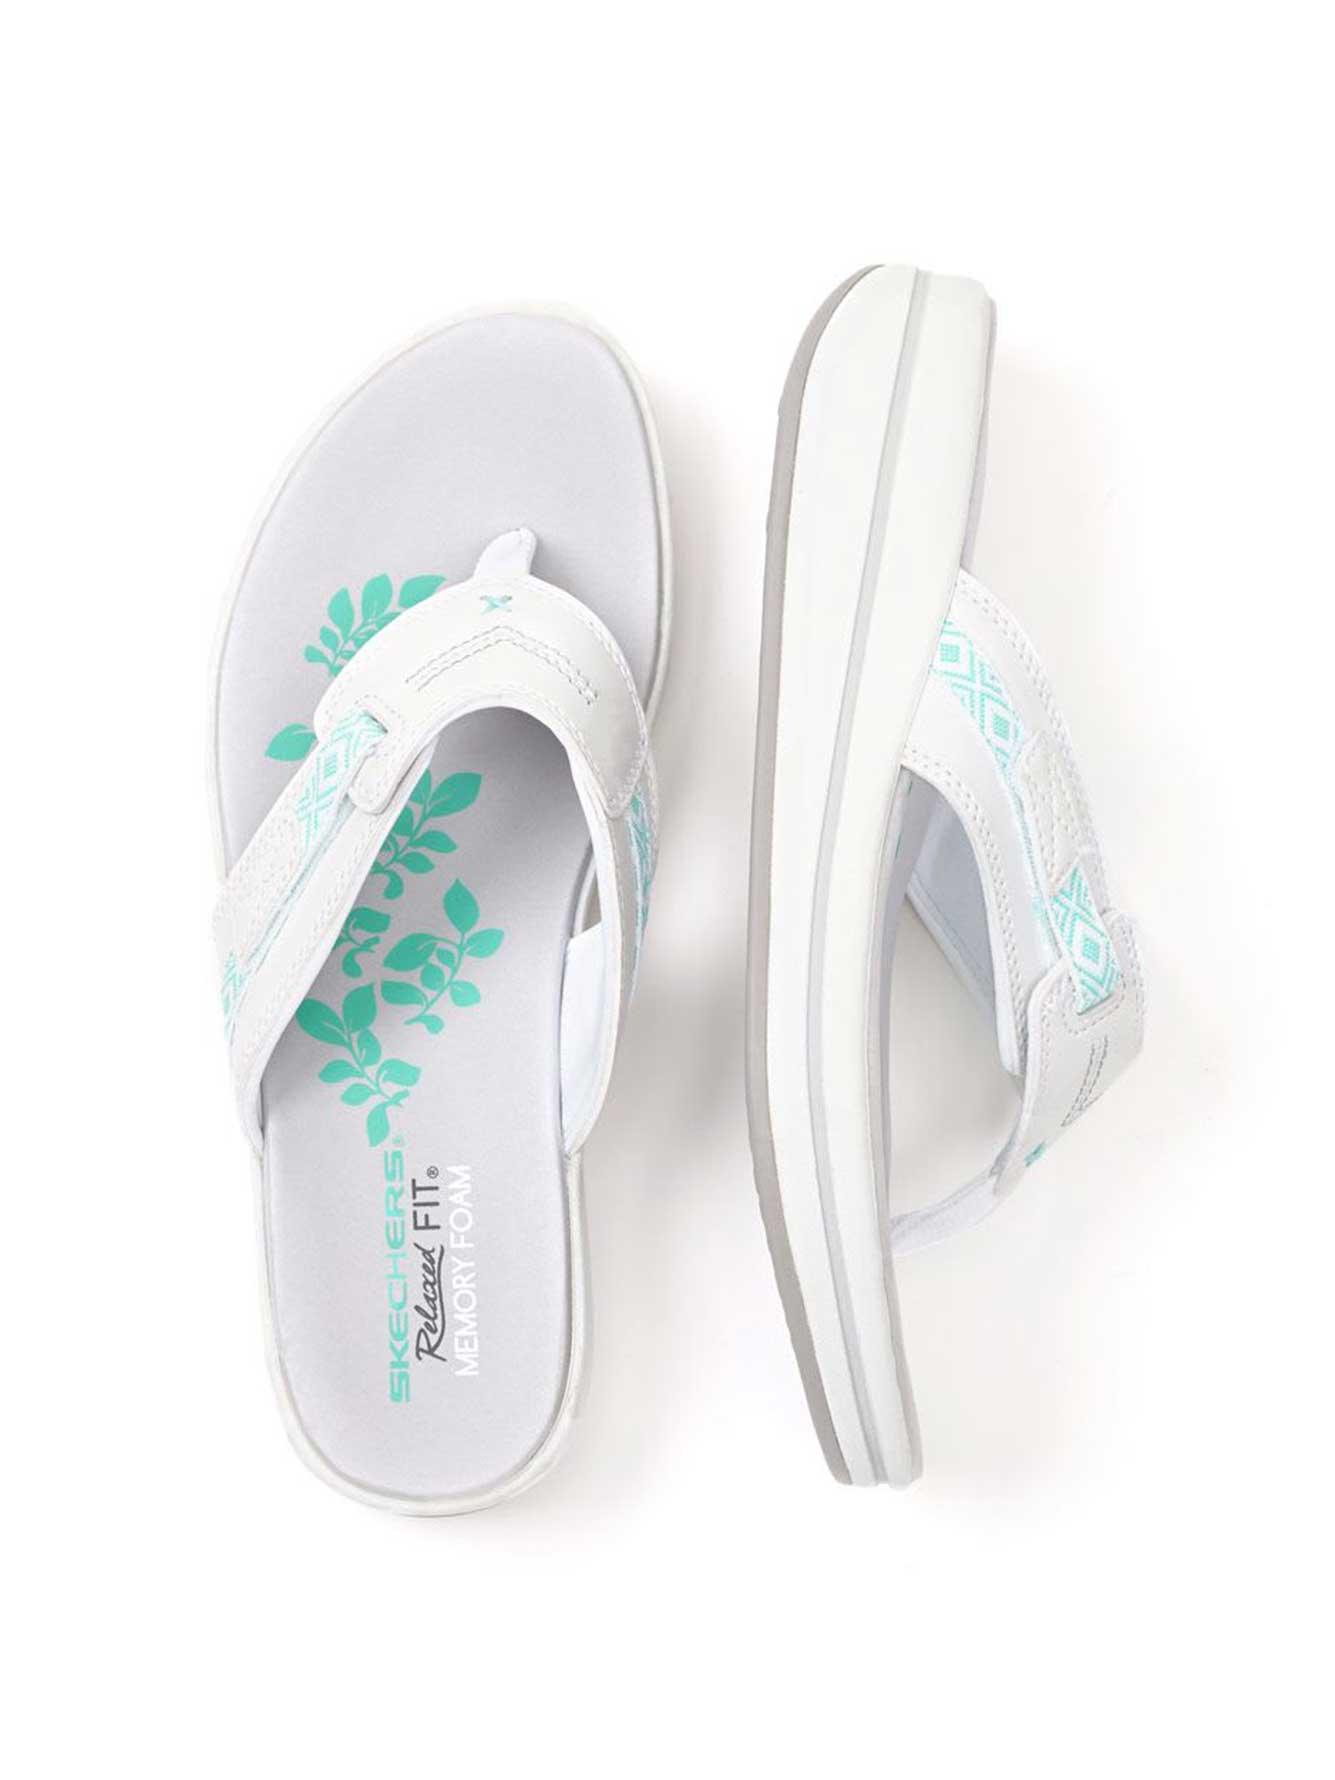 39516fa5207a1a Skechers Wide-Width Flip Flop Sandals